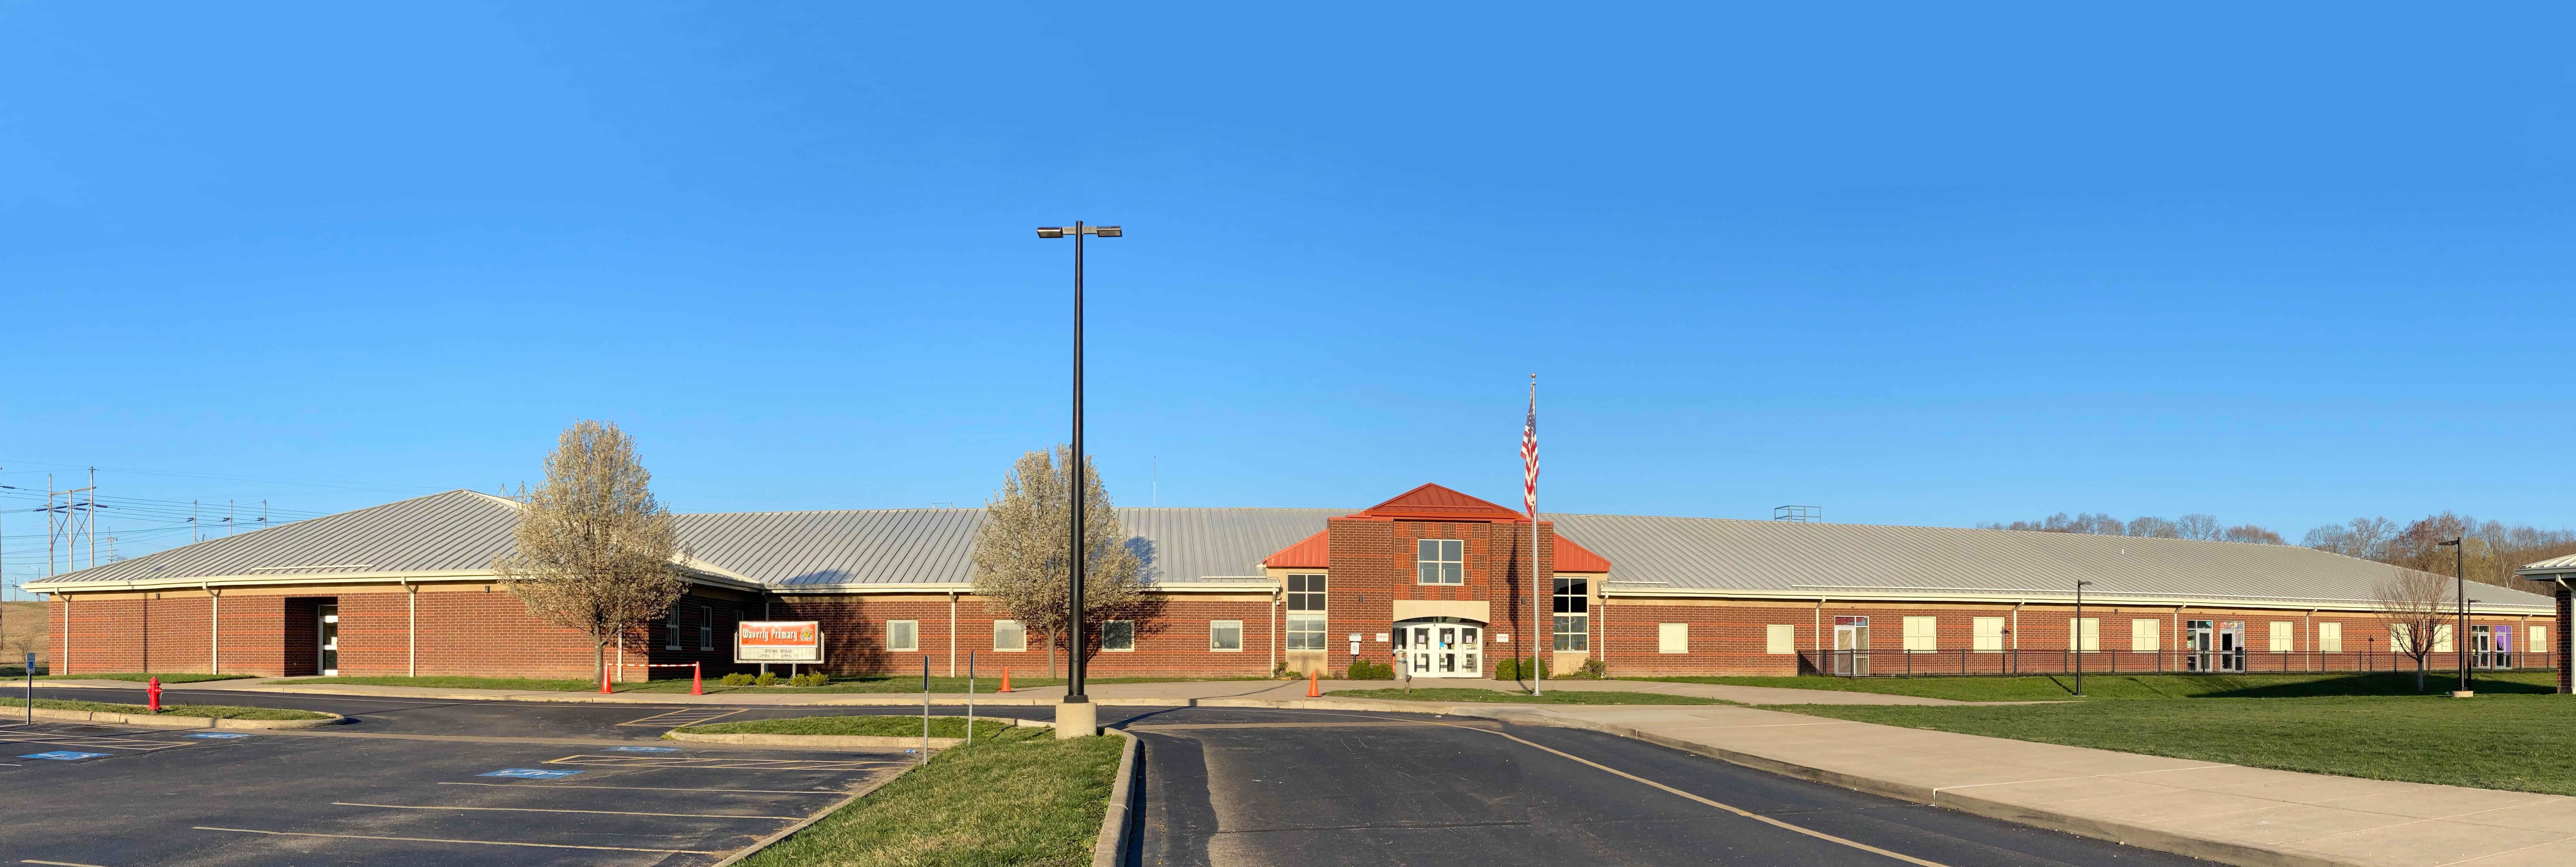 Primary building